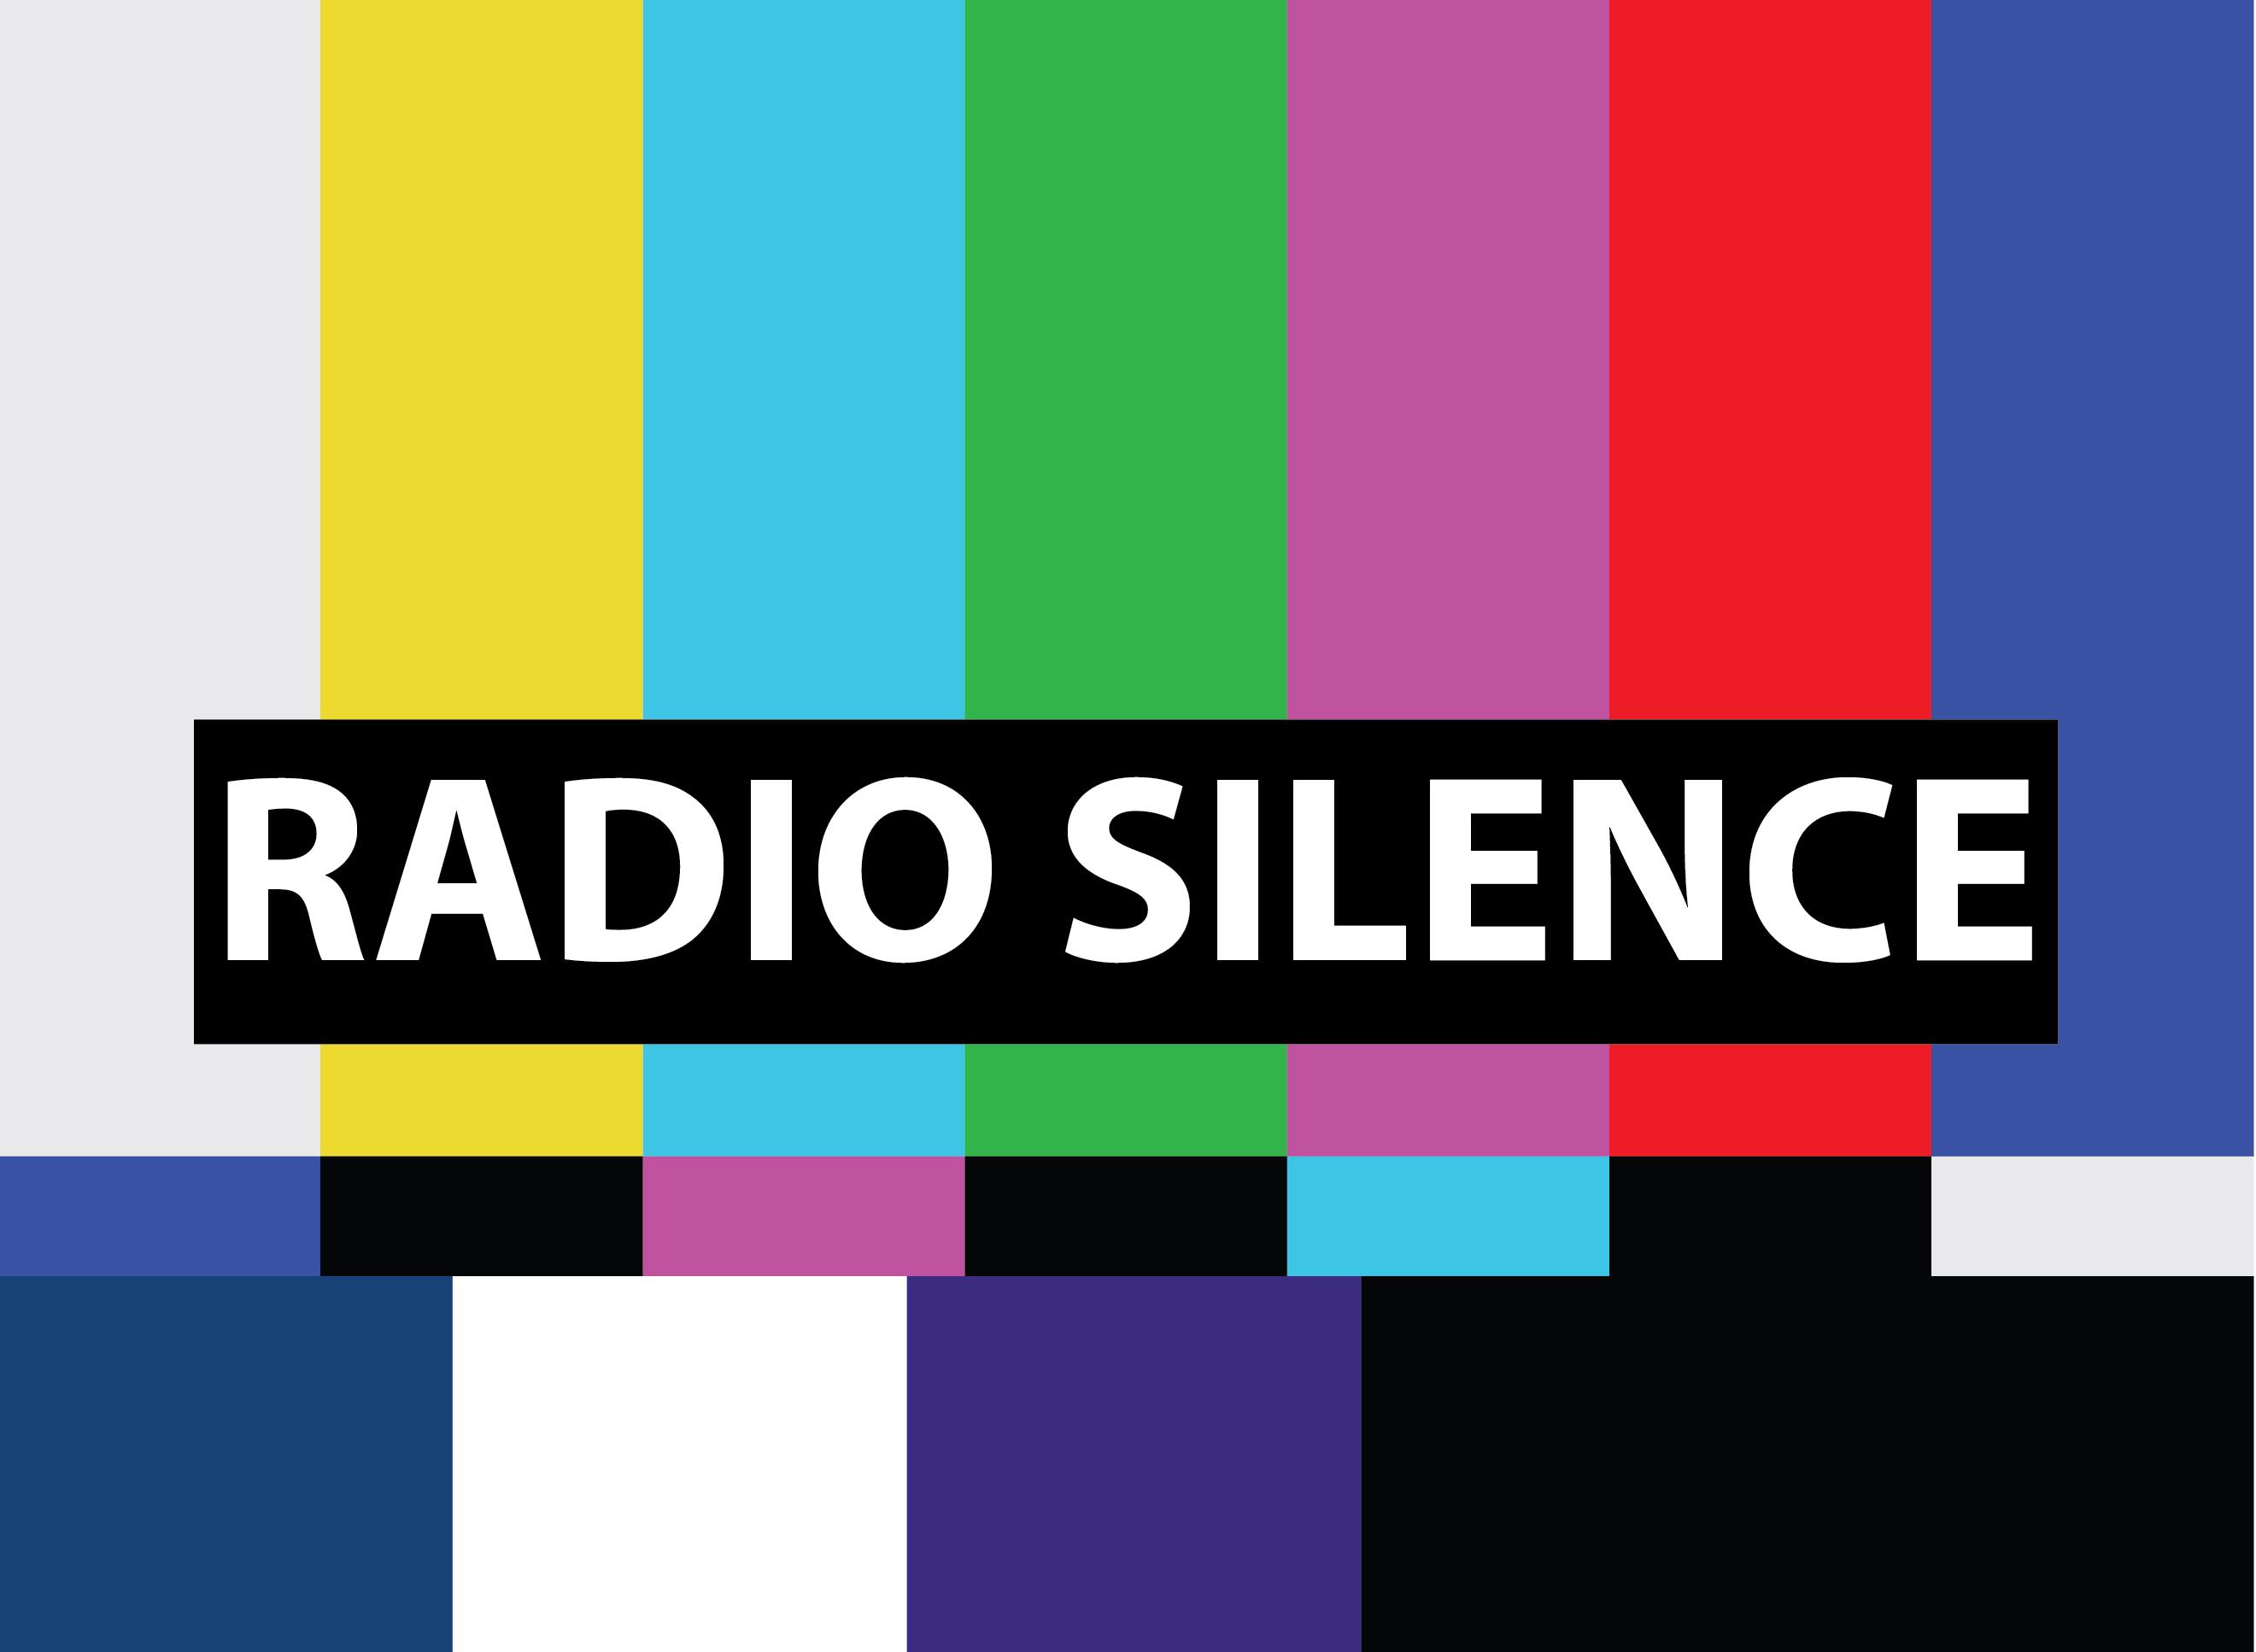 RADIO SILENCE-01-01